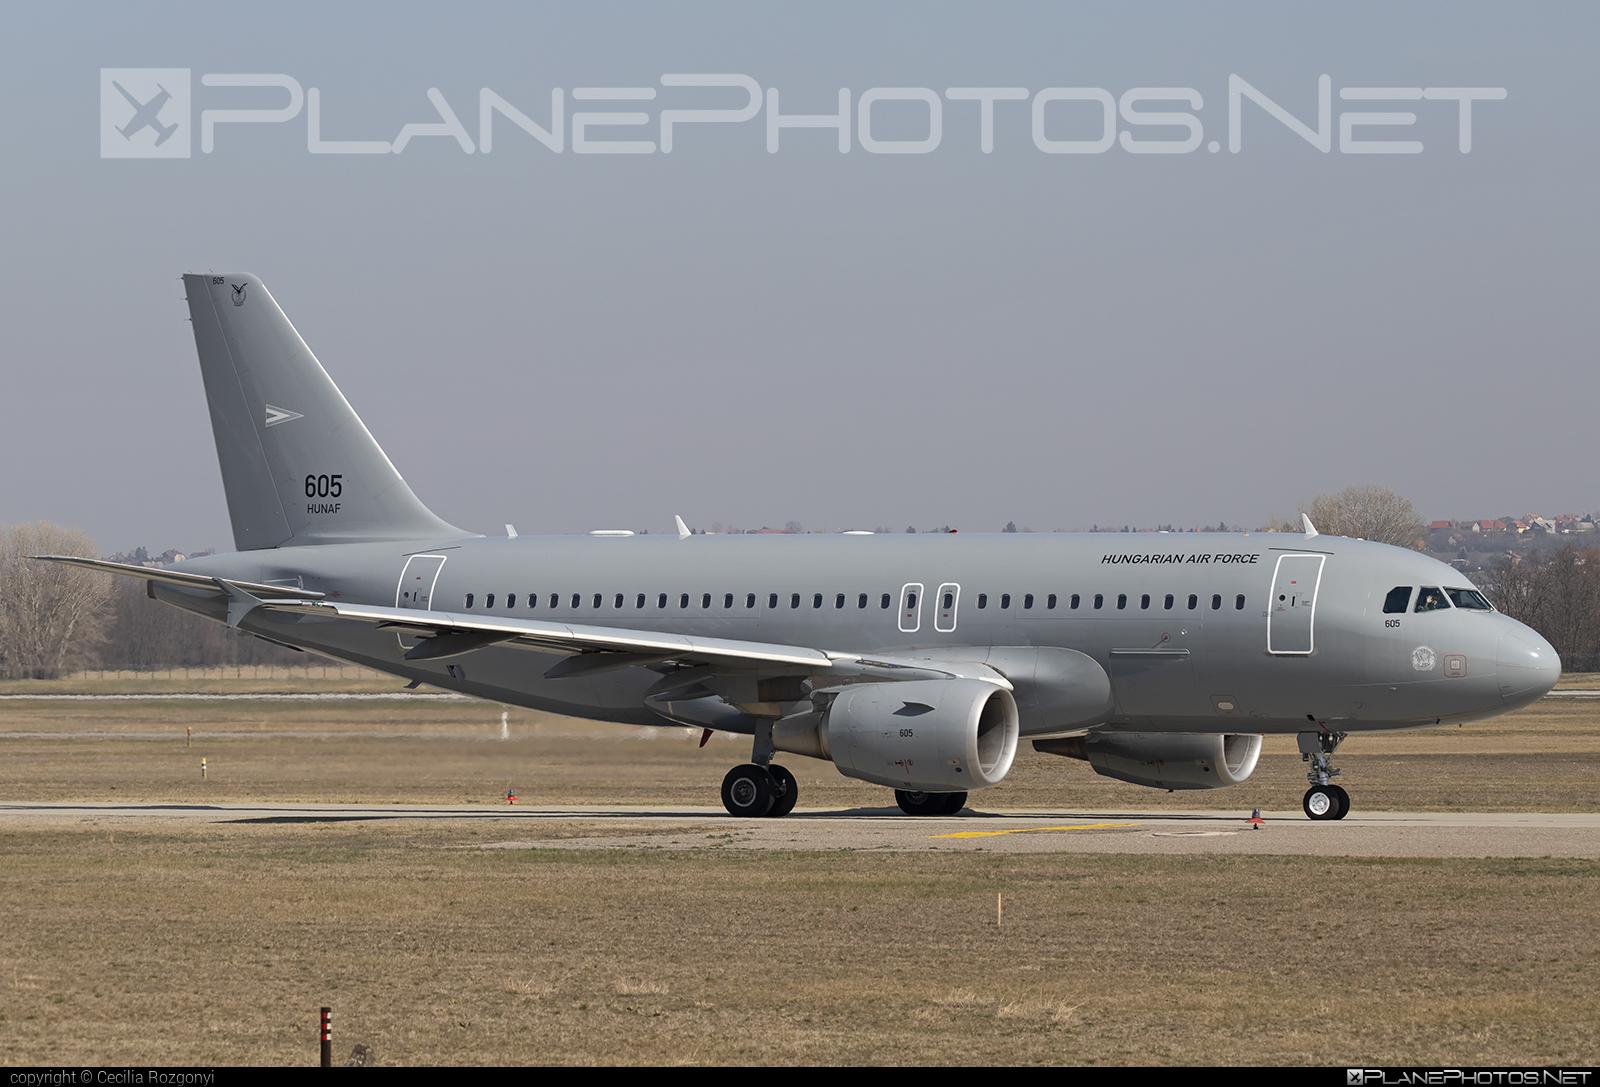 Magyar Légierő (Hungarian Air Force) Airbus A319-112 - 605 #a319 #a320family #airbus #airbus319 #hungarianairforce #magyarlegiero